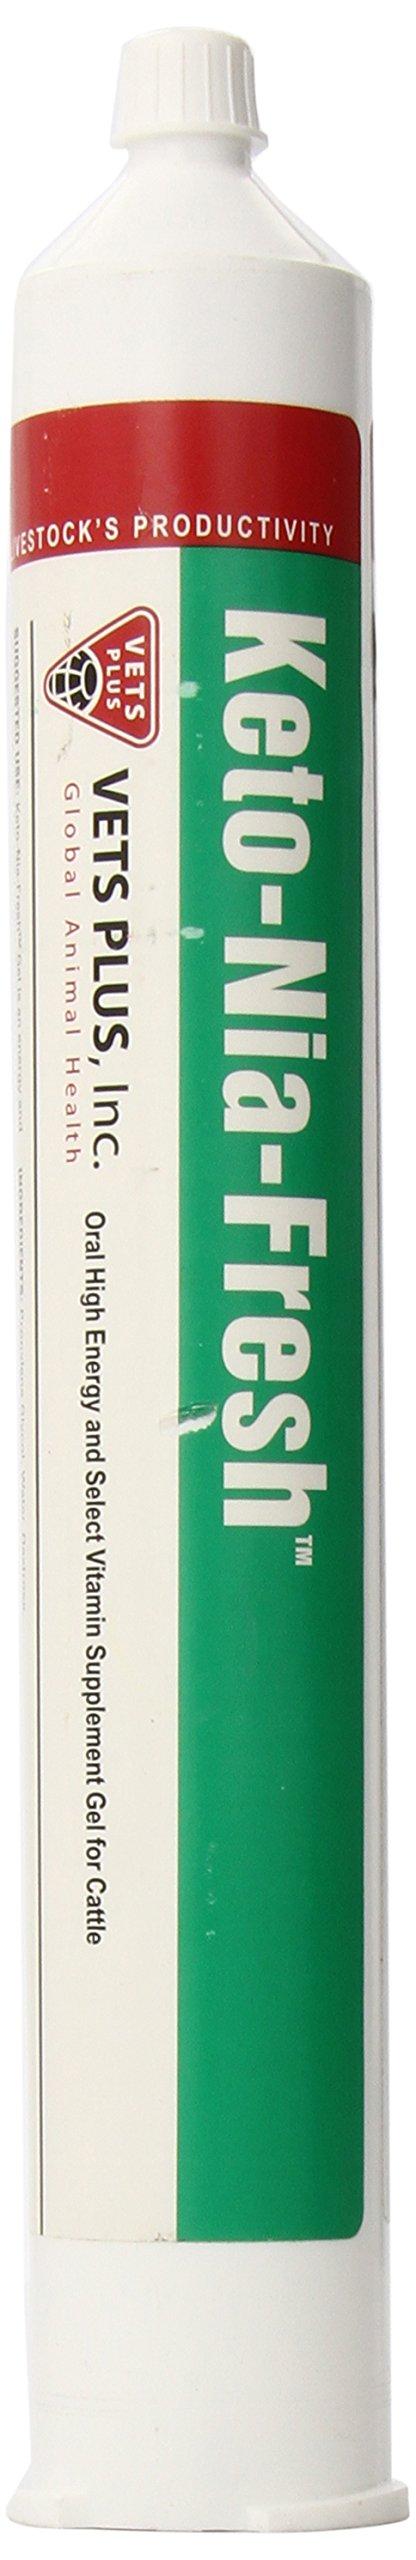 Vets Plus Keto-Nia Fresh Gel Horse Supplement, 300cc by Vet's Plus